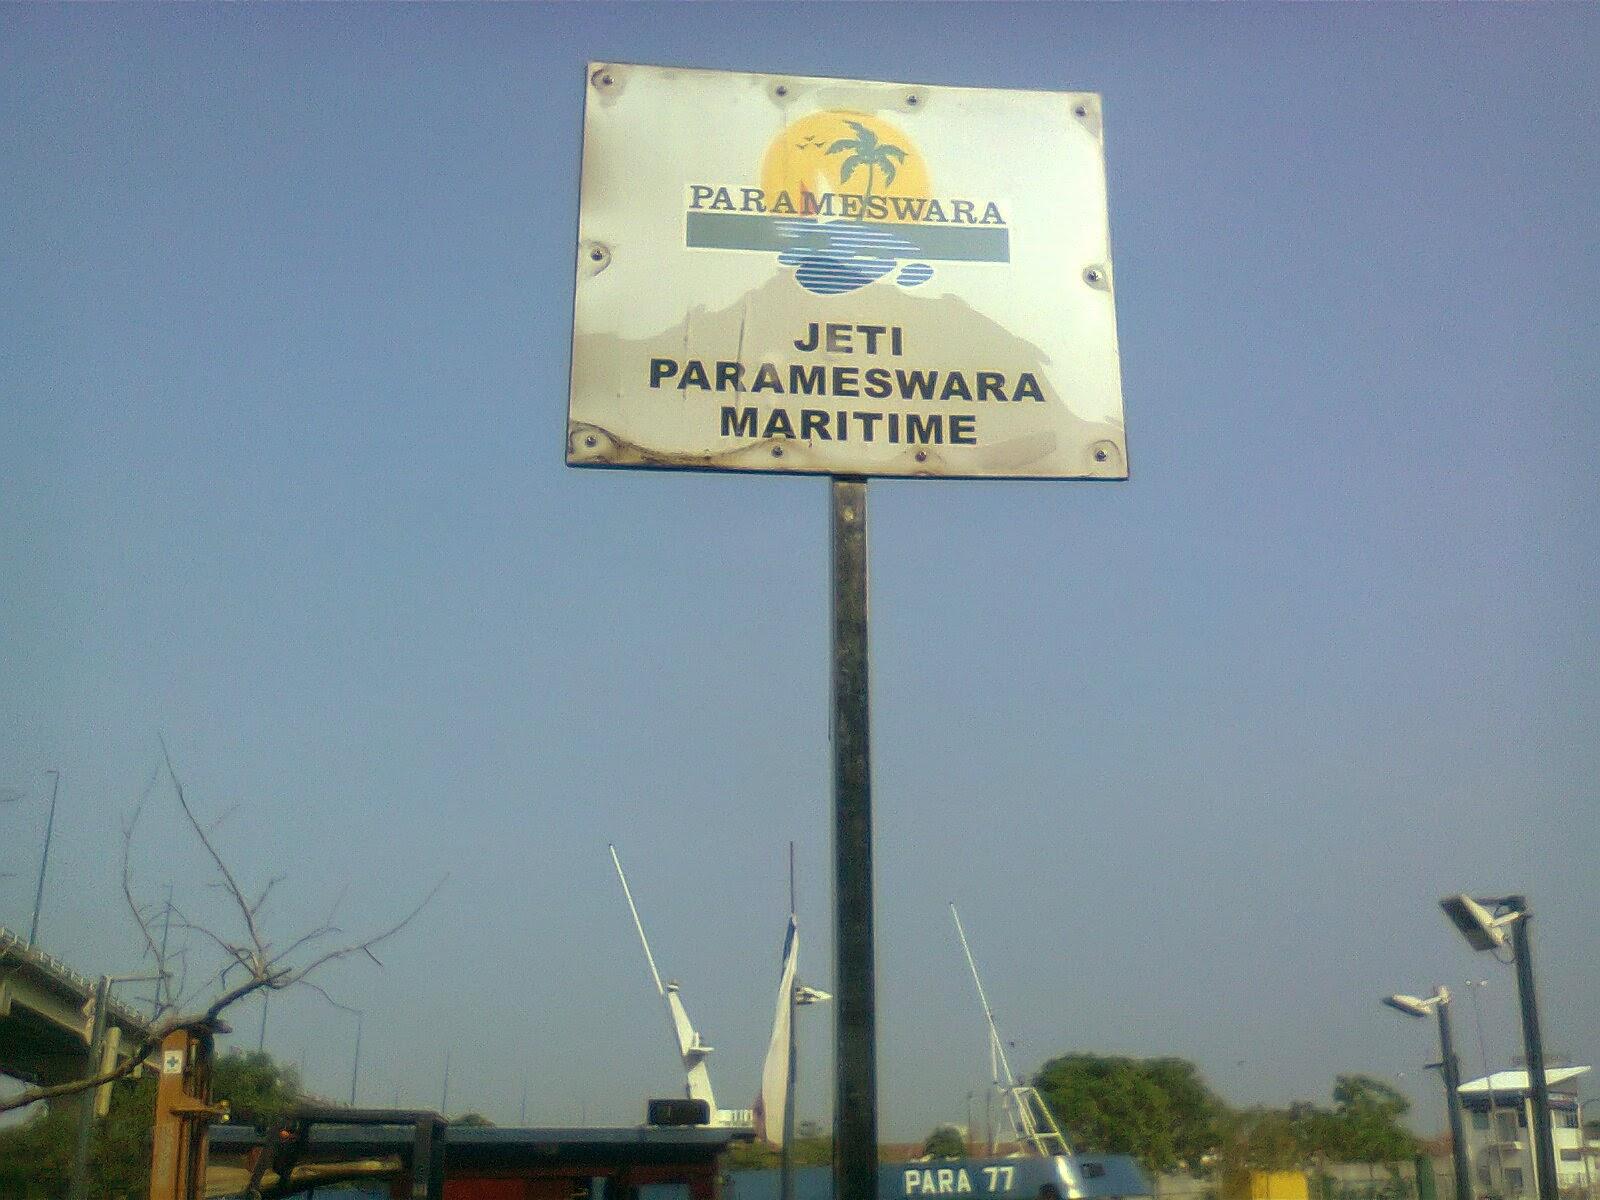 jeti parameswara